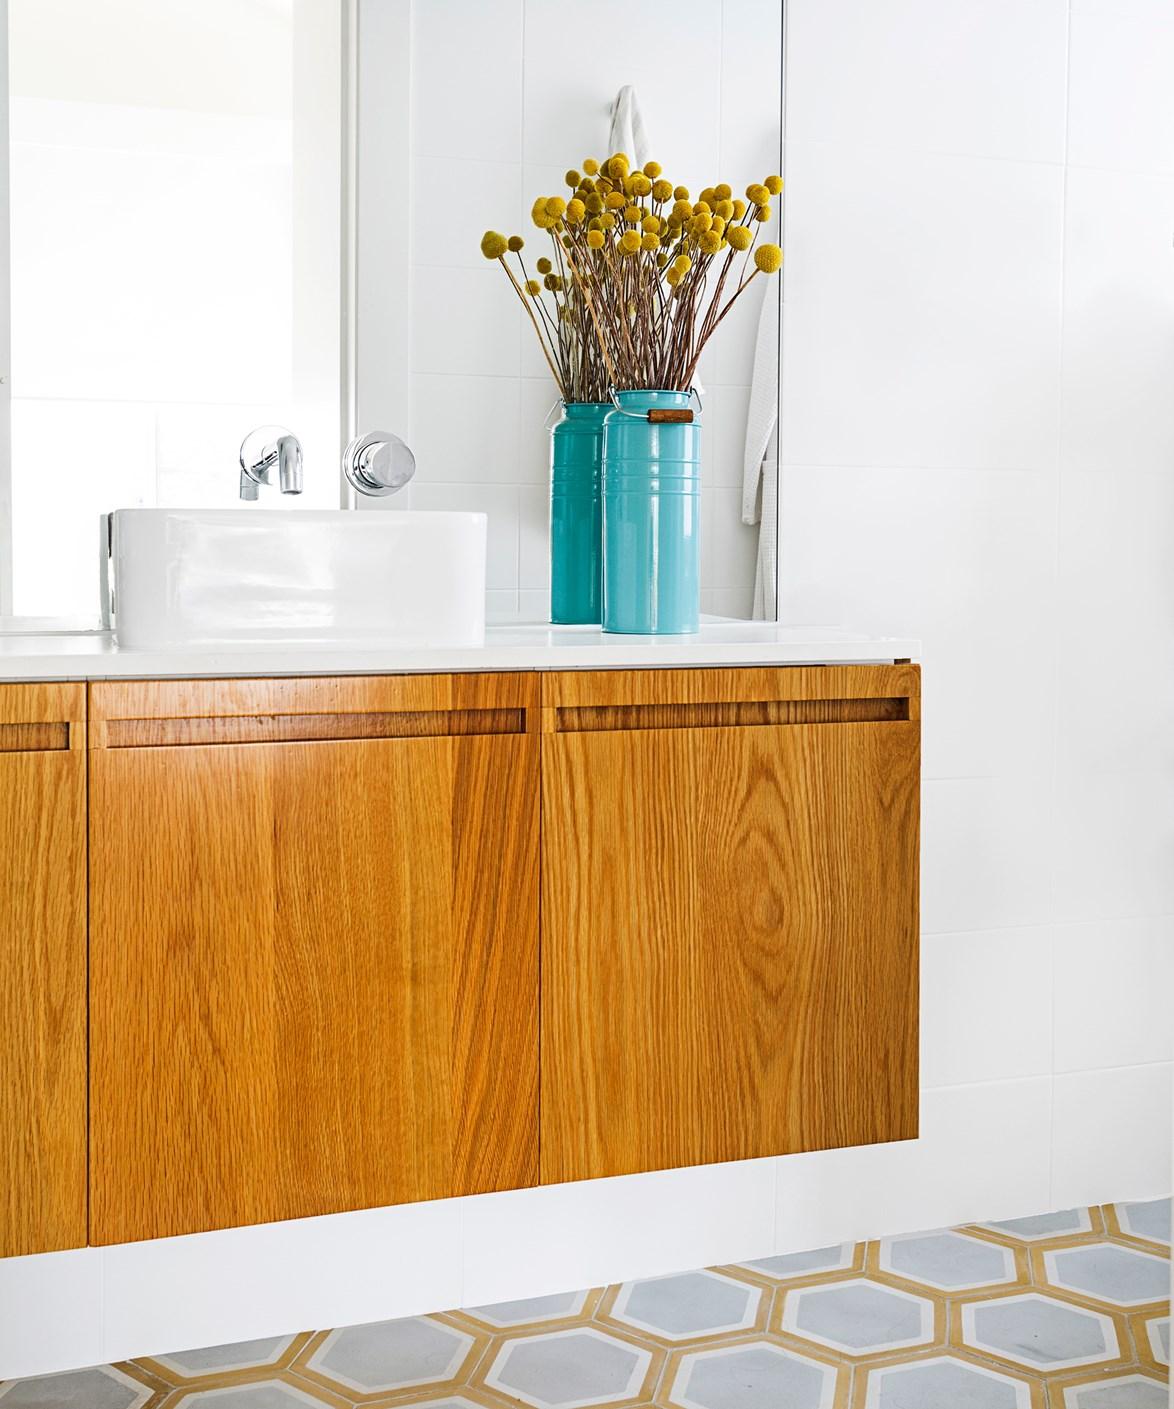 "Hexagonal floor tiles echo the warm honey shades of the timber vanity. This [home on Bondi beach](https://www.homestolove.com.au/gallery-romy-alwills-budget-conscious-renovation-1963|target=""_blank"") belongs to interior designer Romy Alwill."